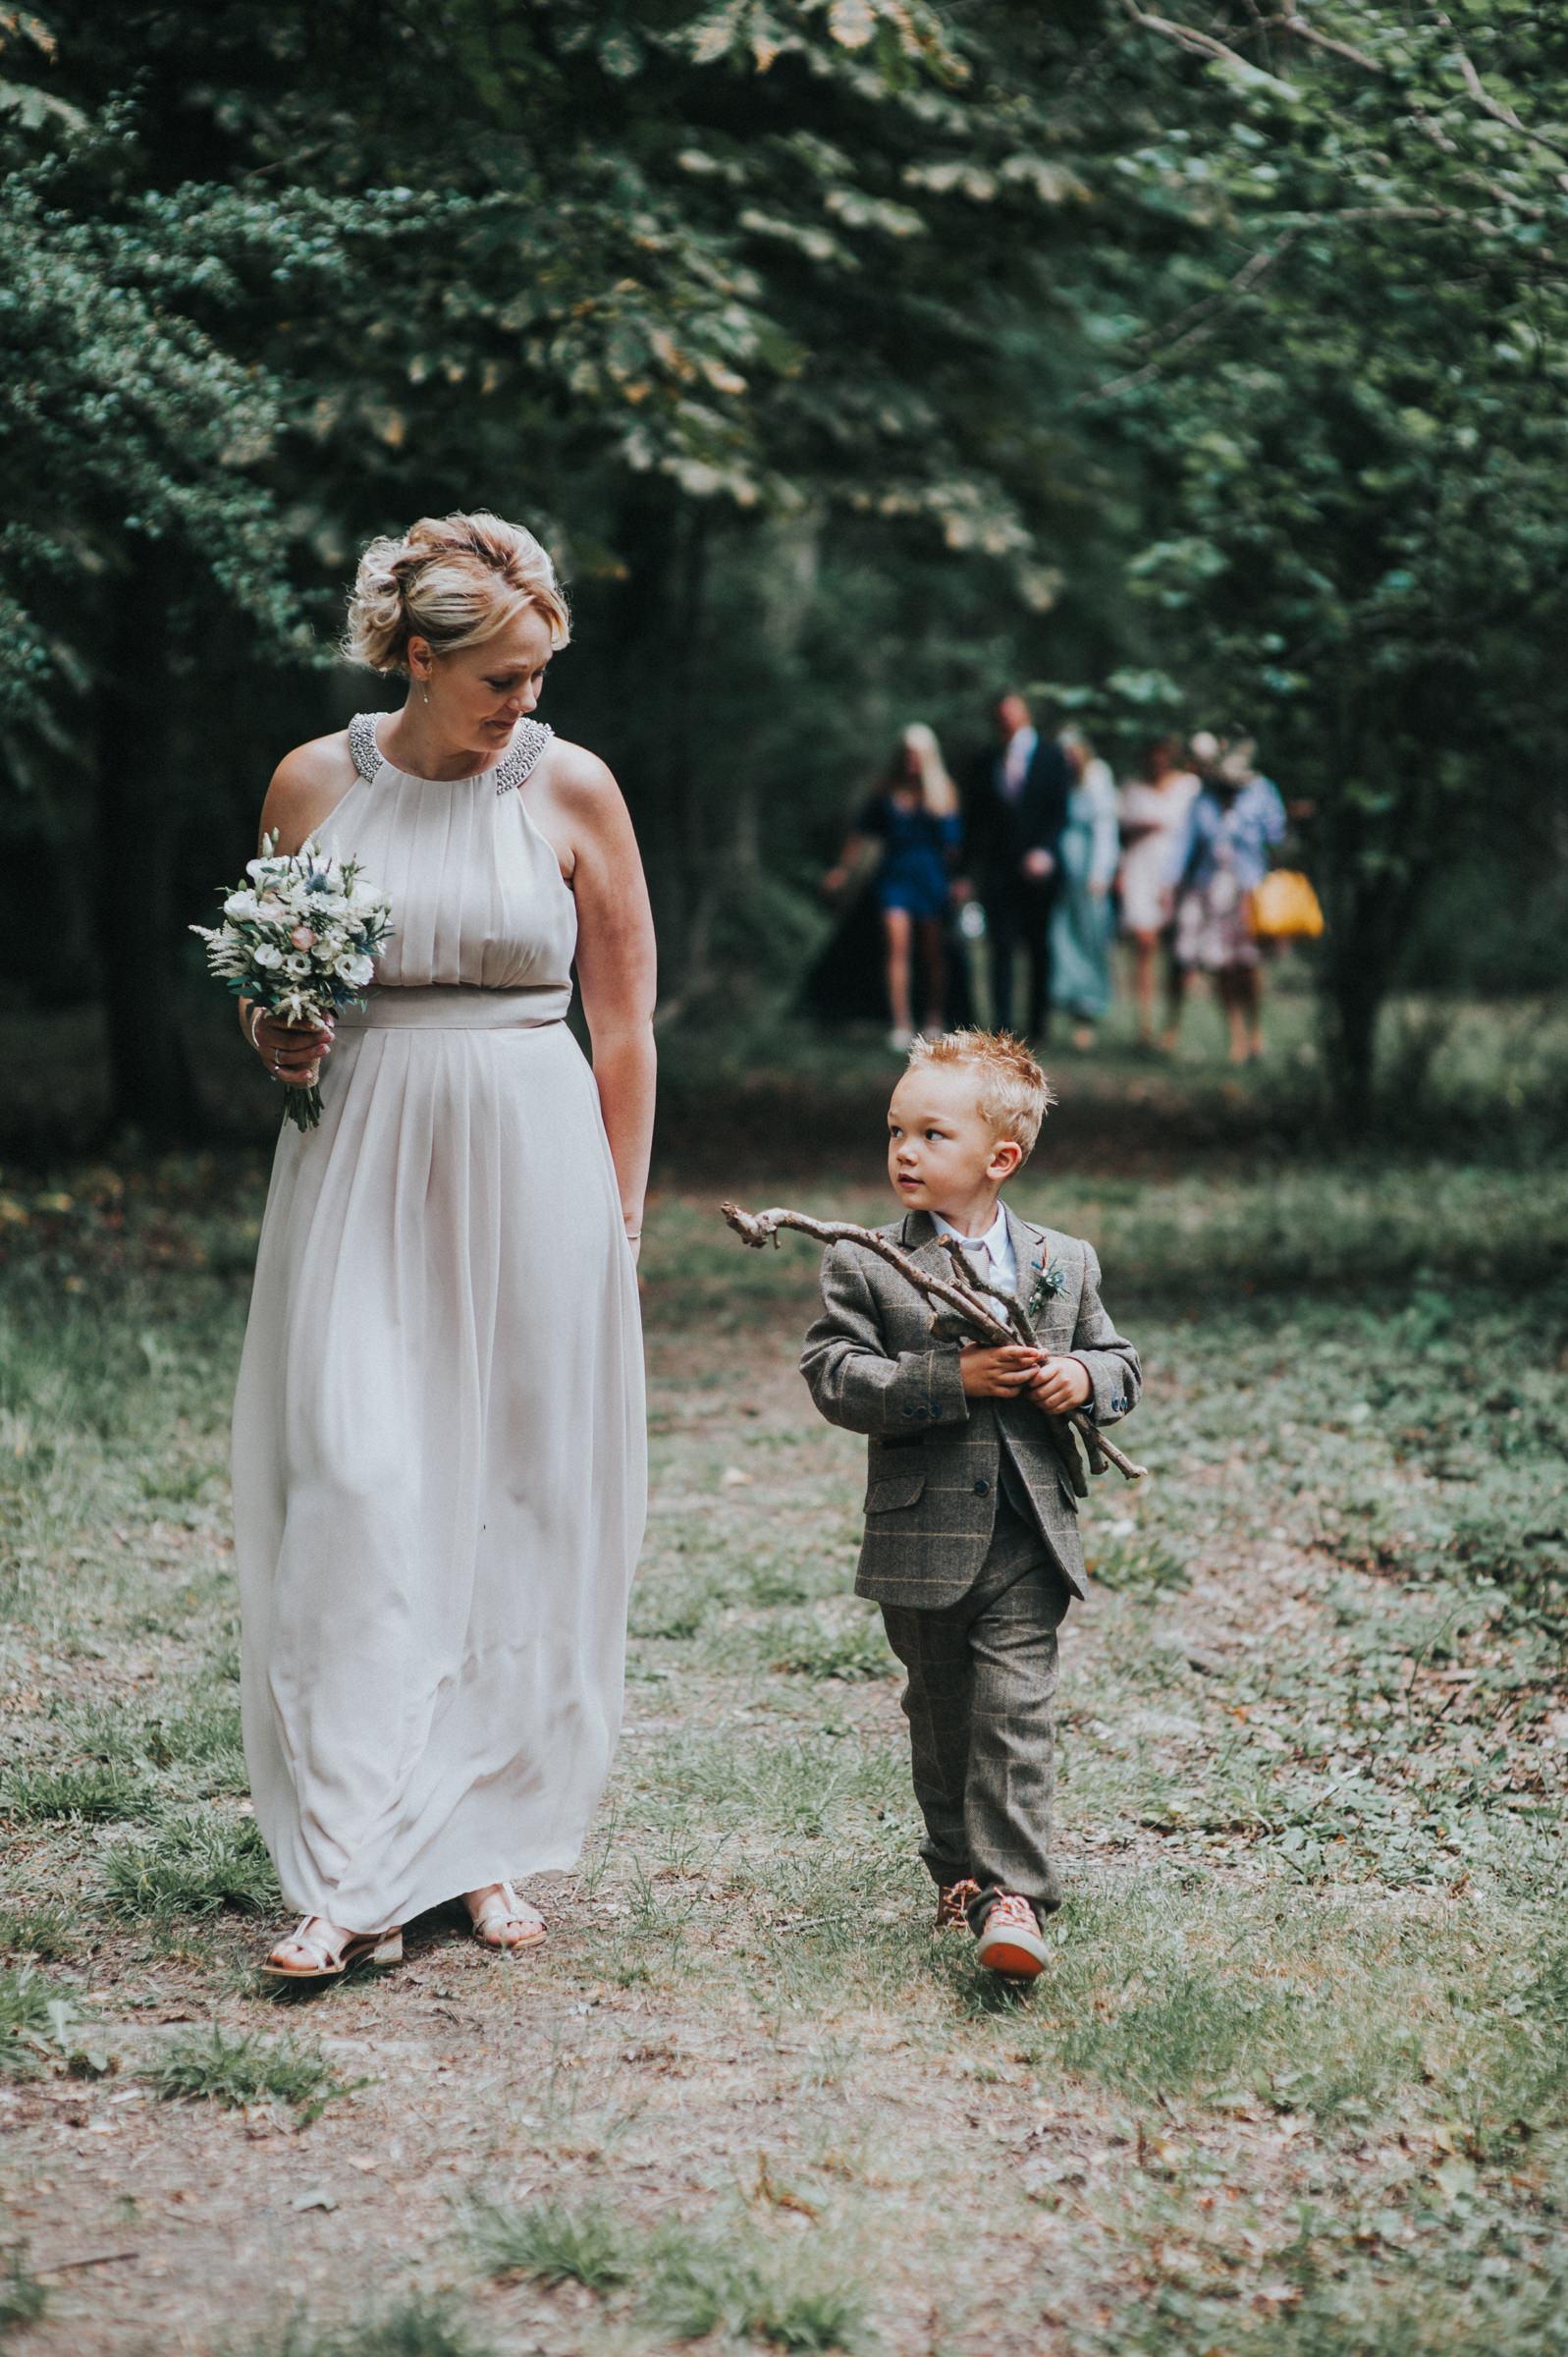 Falconhurst Kent Wedding Venue Sussex Weddings-6660.JPG